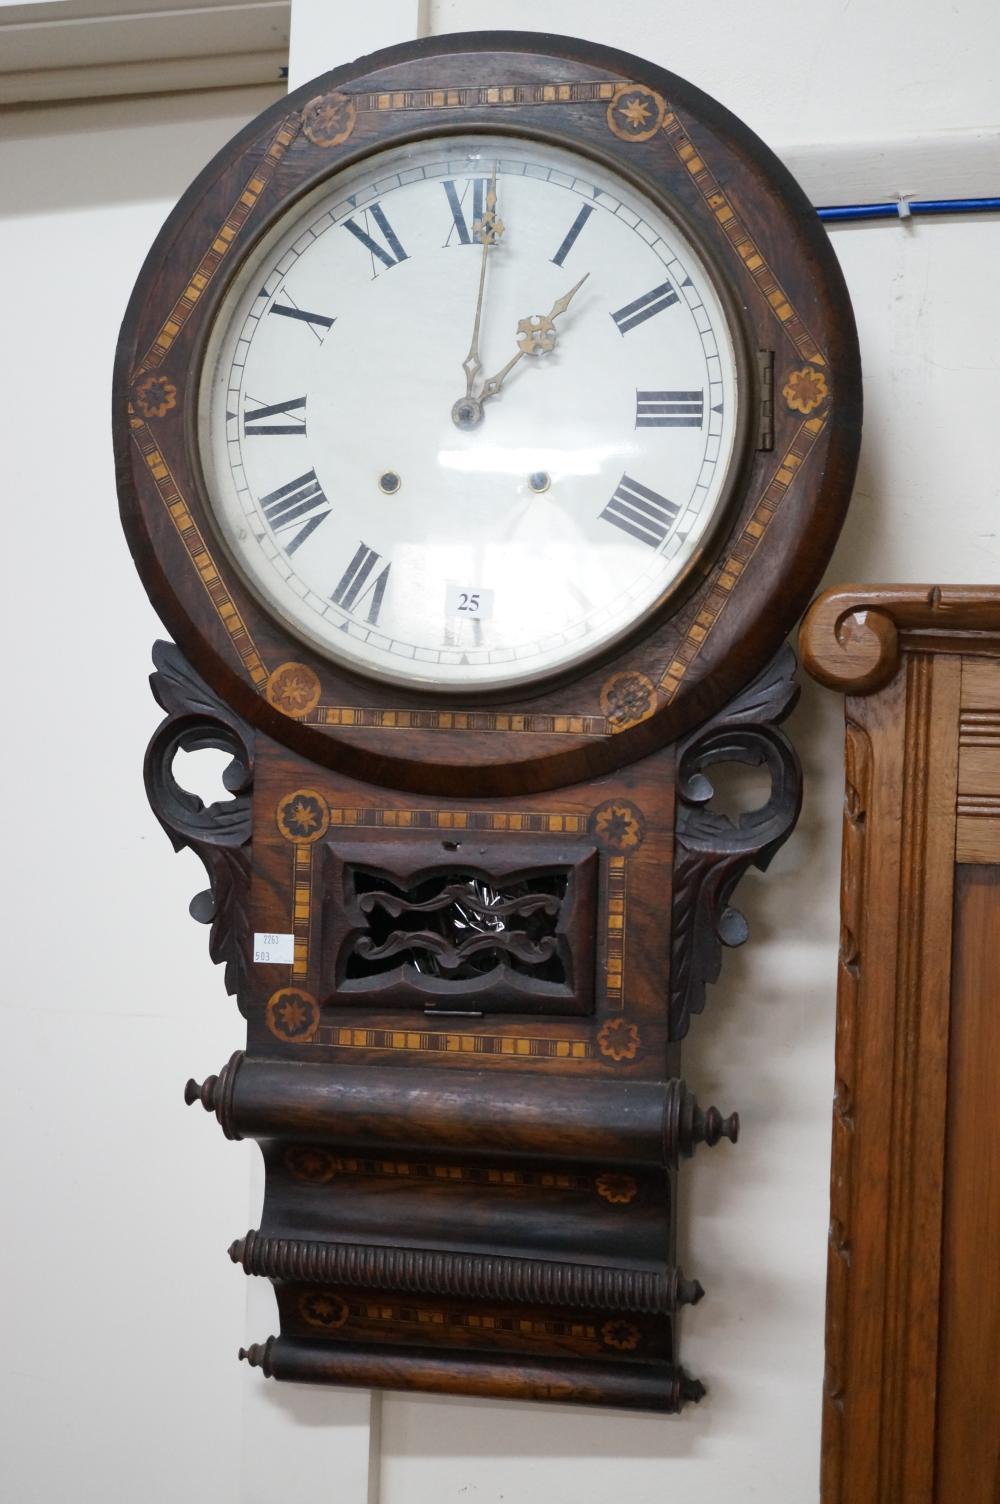 C19th American inlaid walnut drop dial regulator wall clock 77 cm high